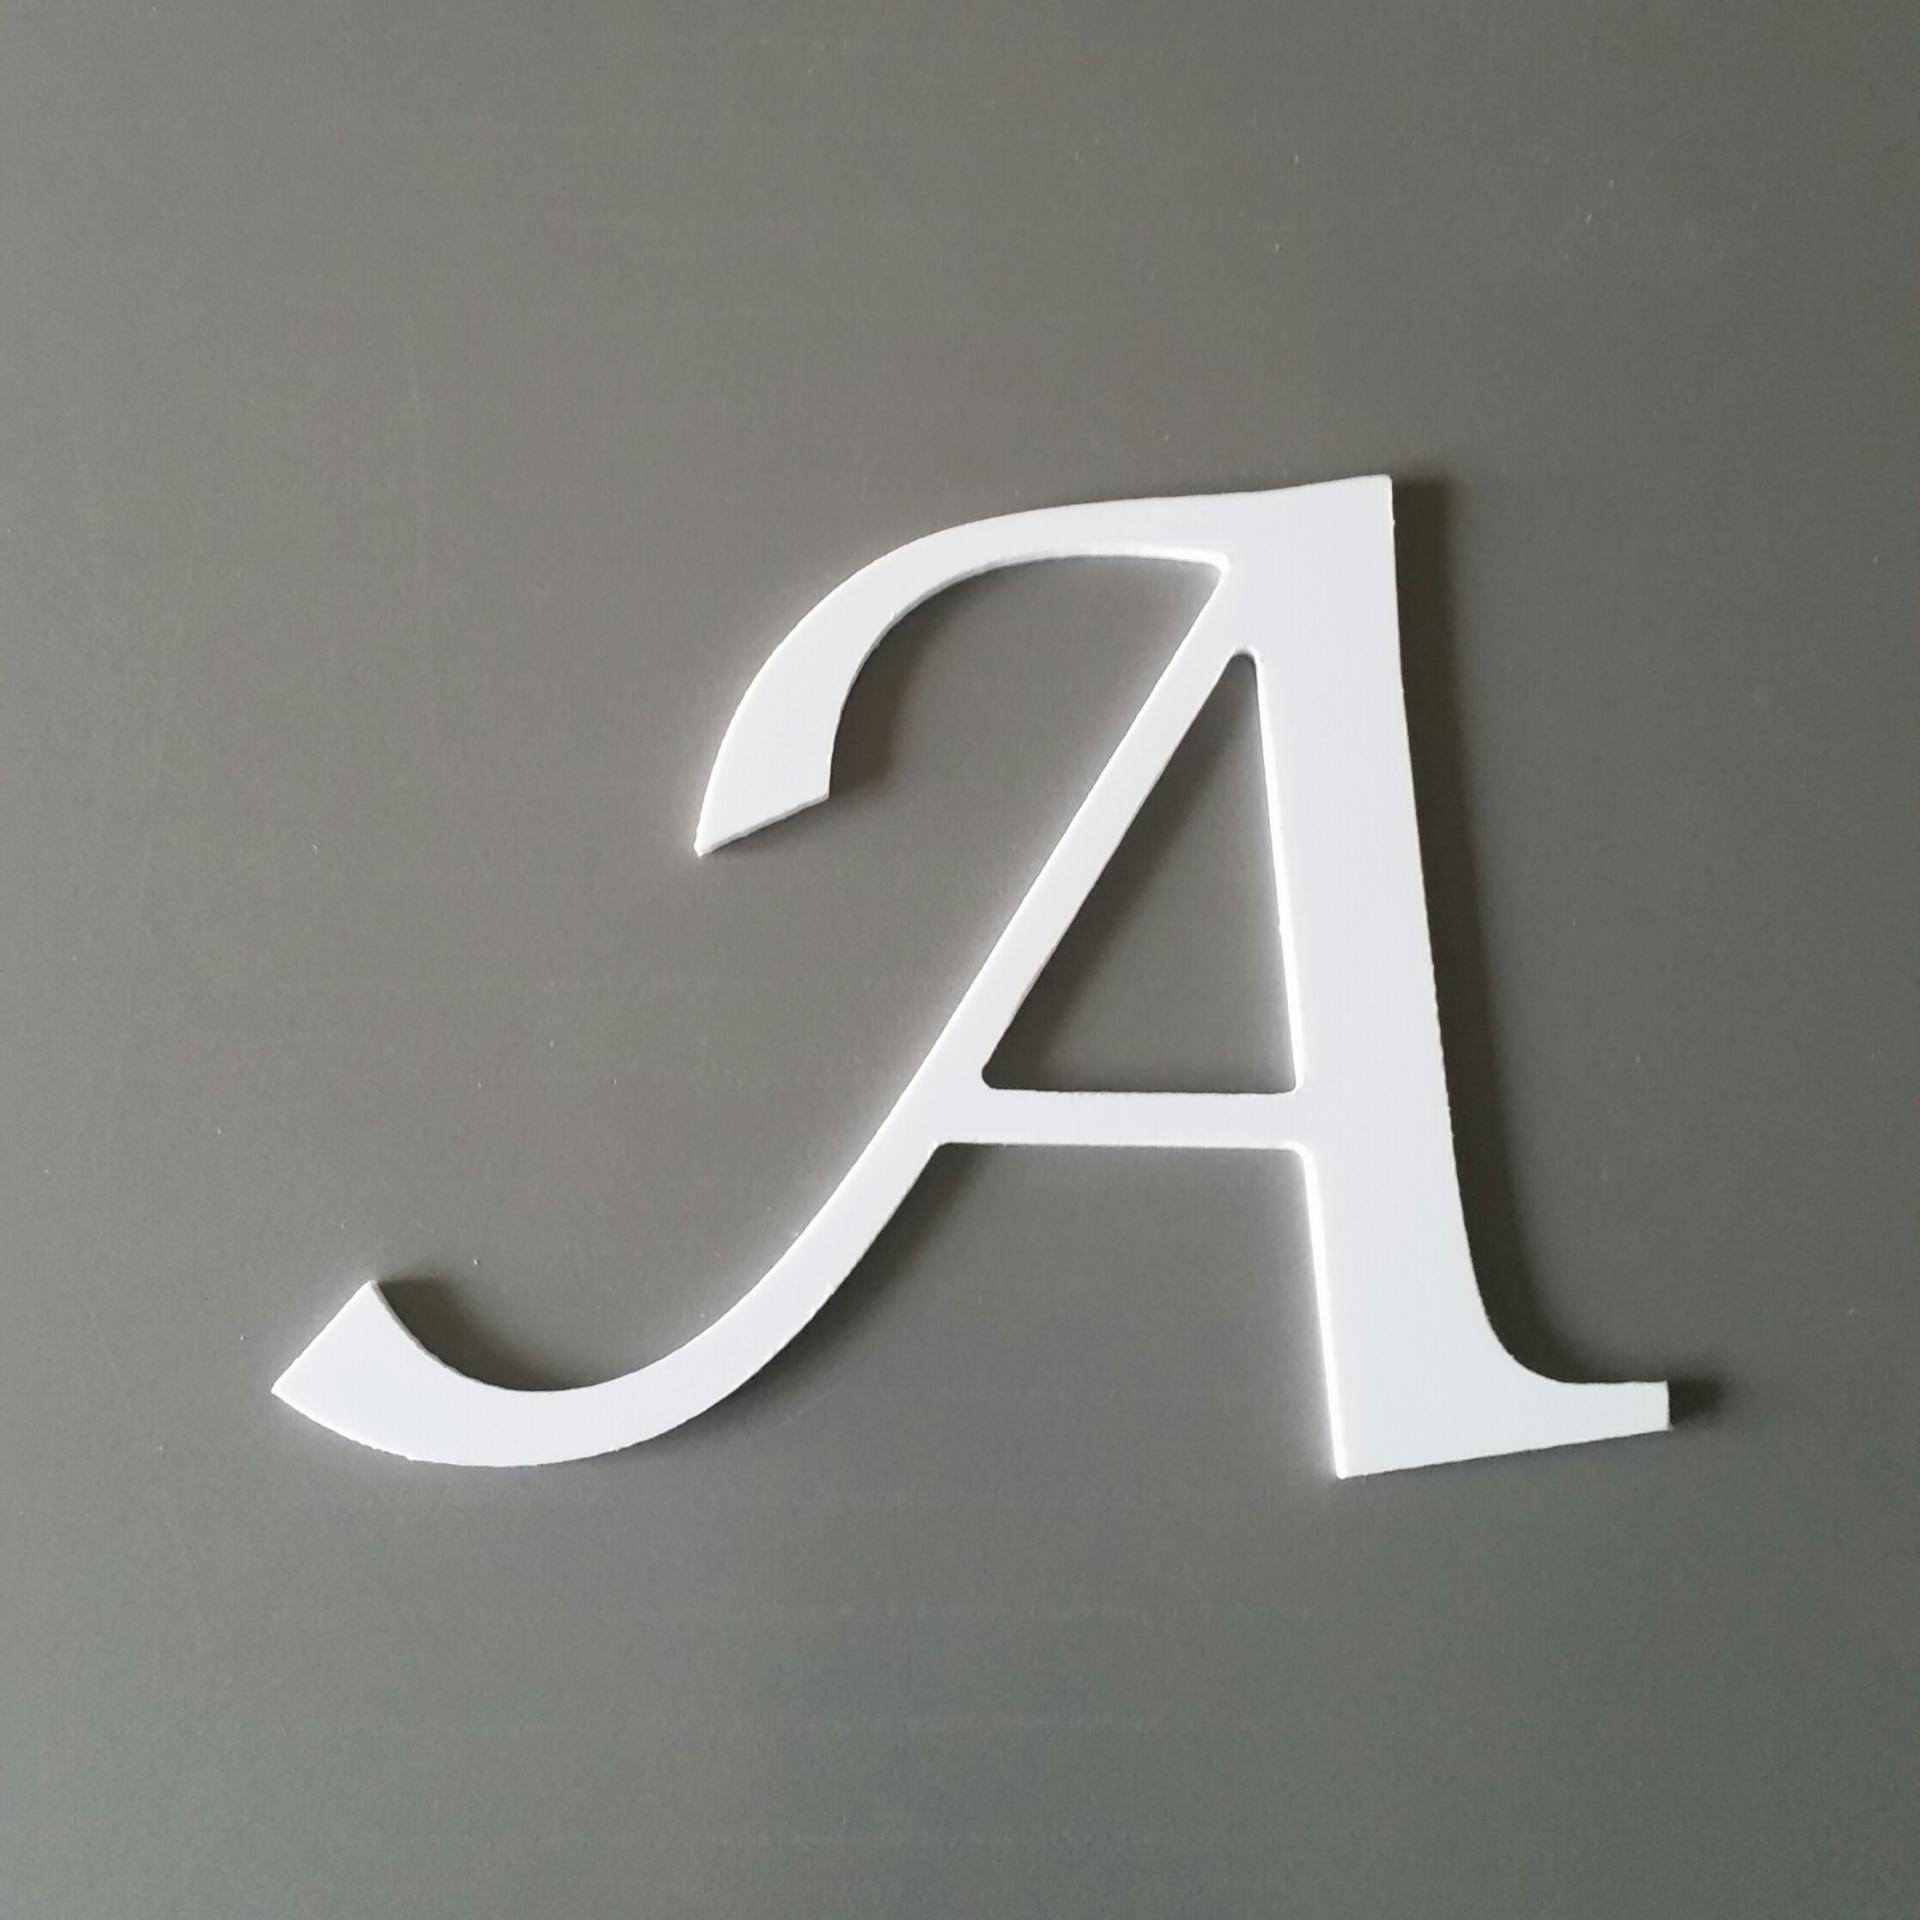 Lettre enseigne lucida calligraphy